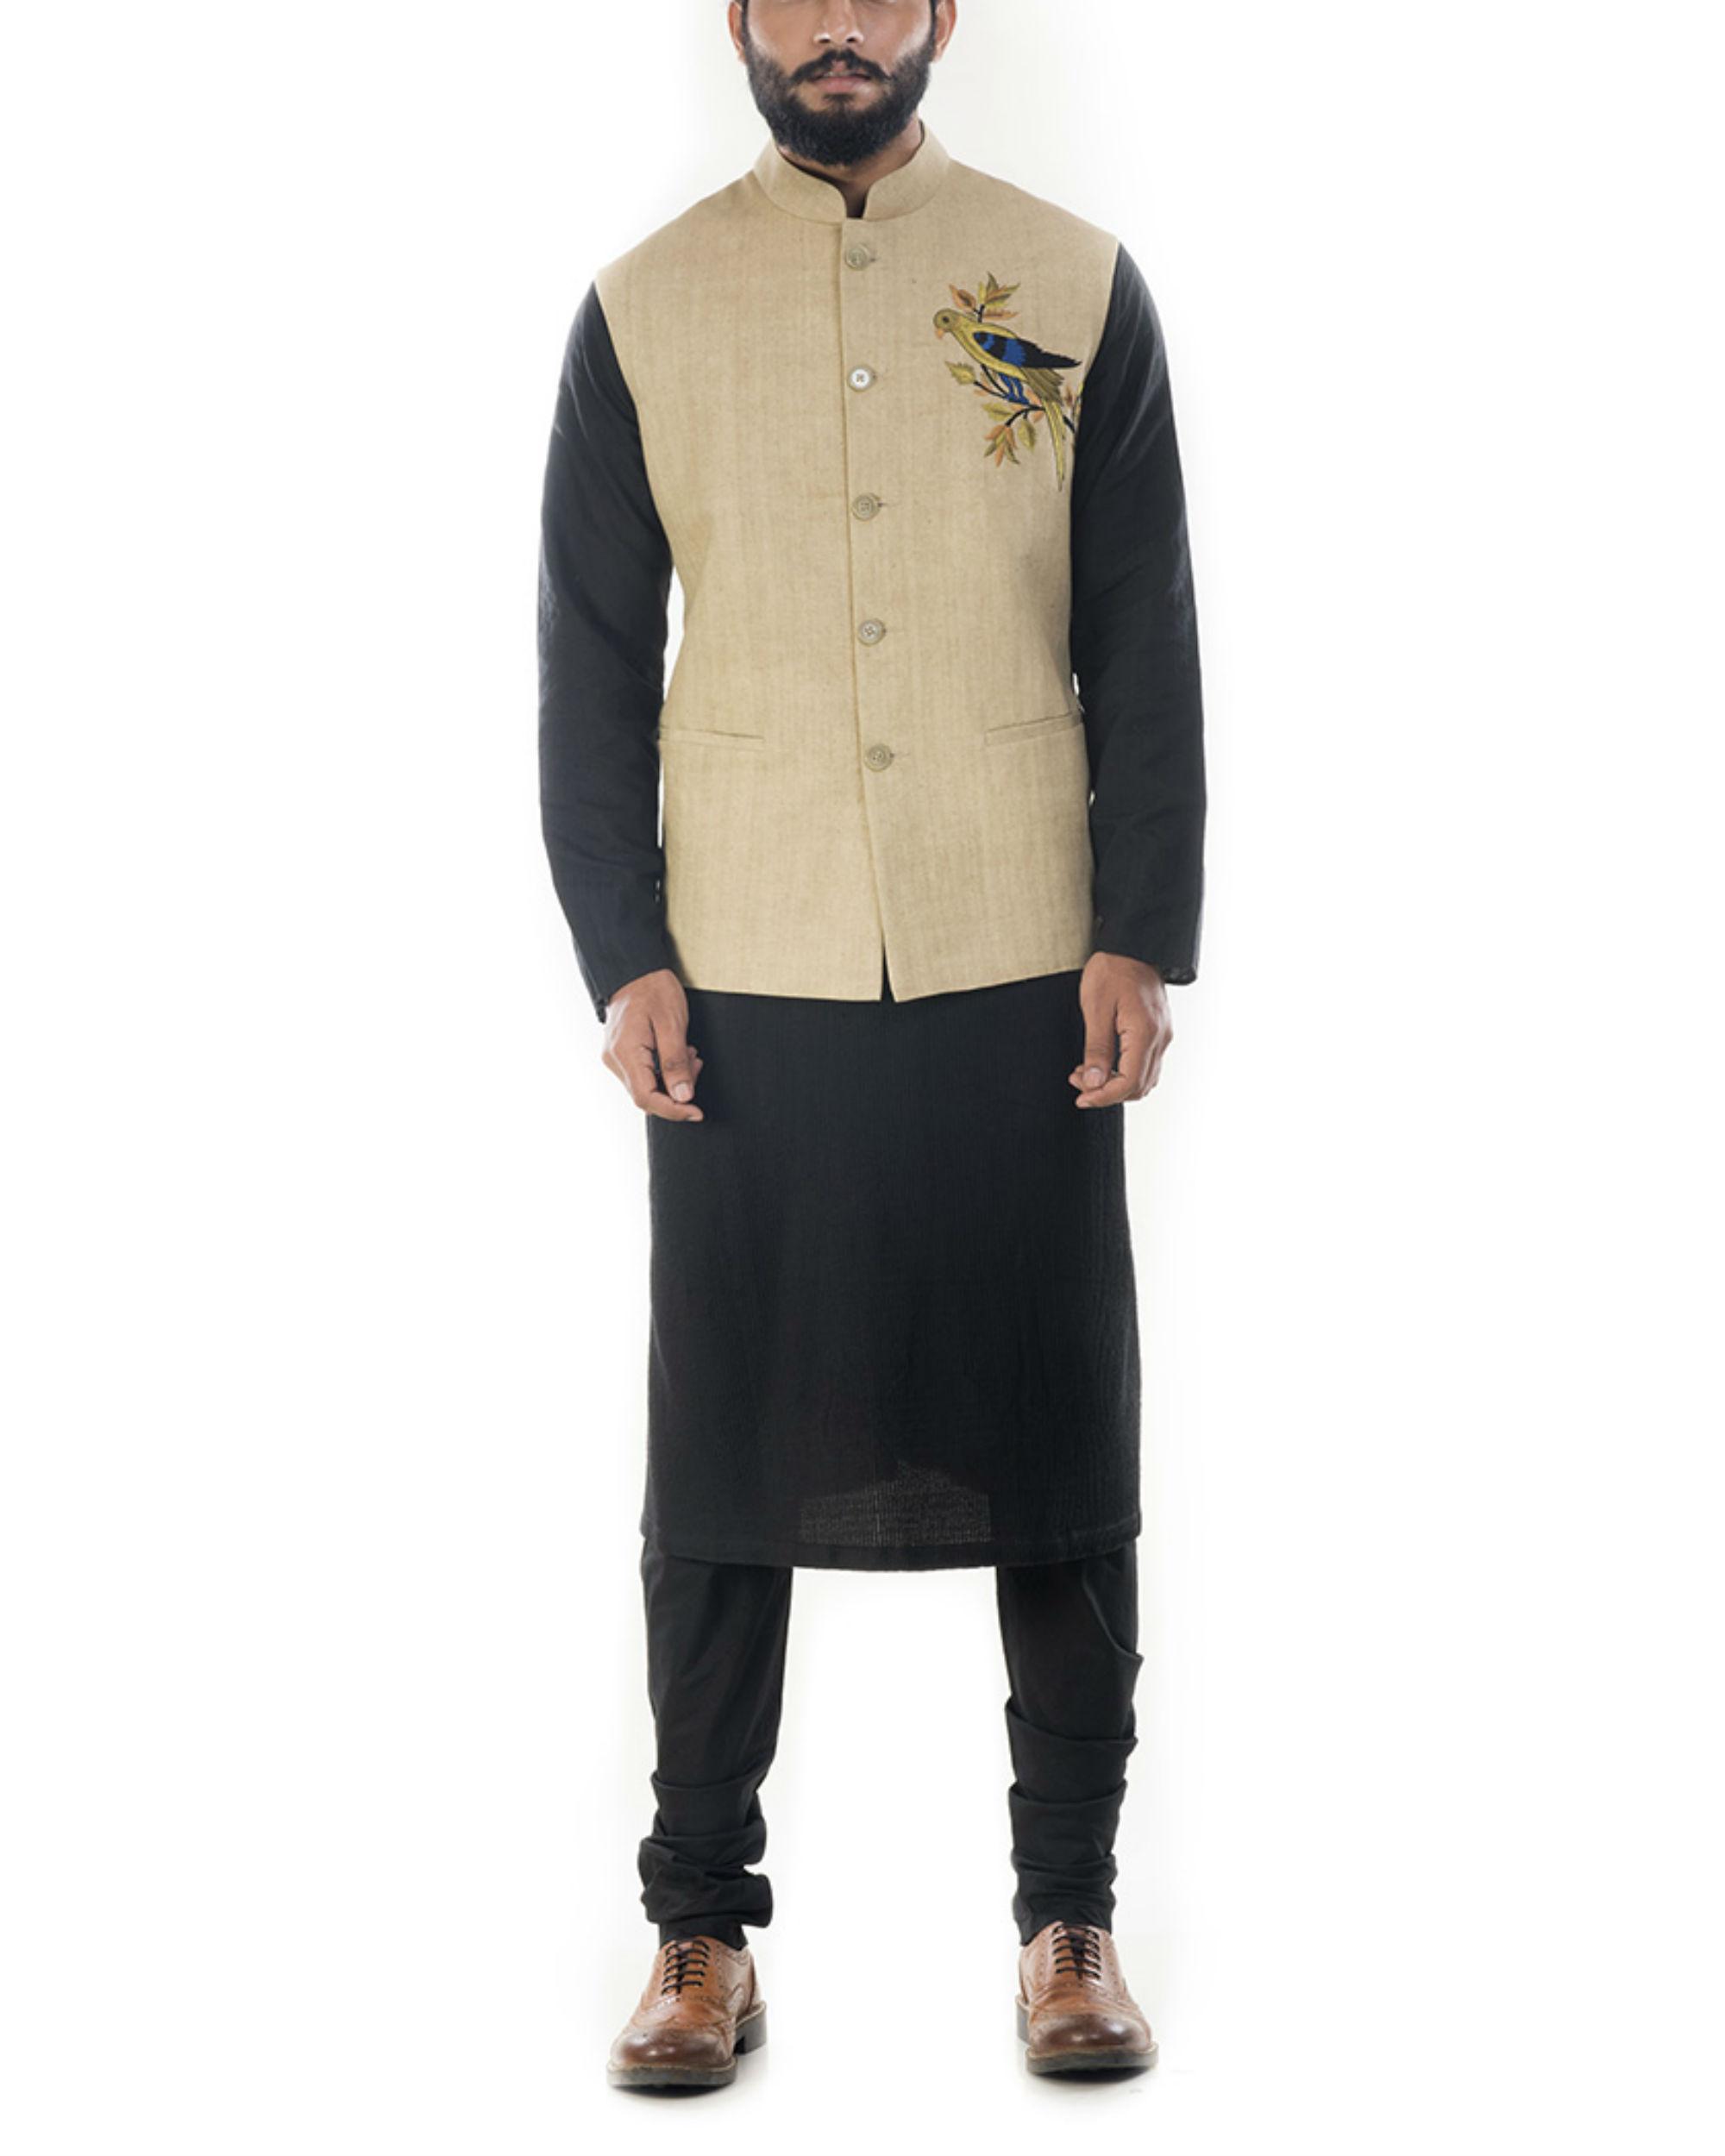 Beige motif embroidered waistcoat